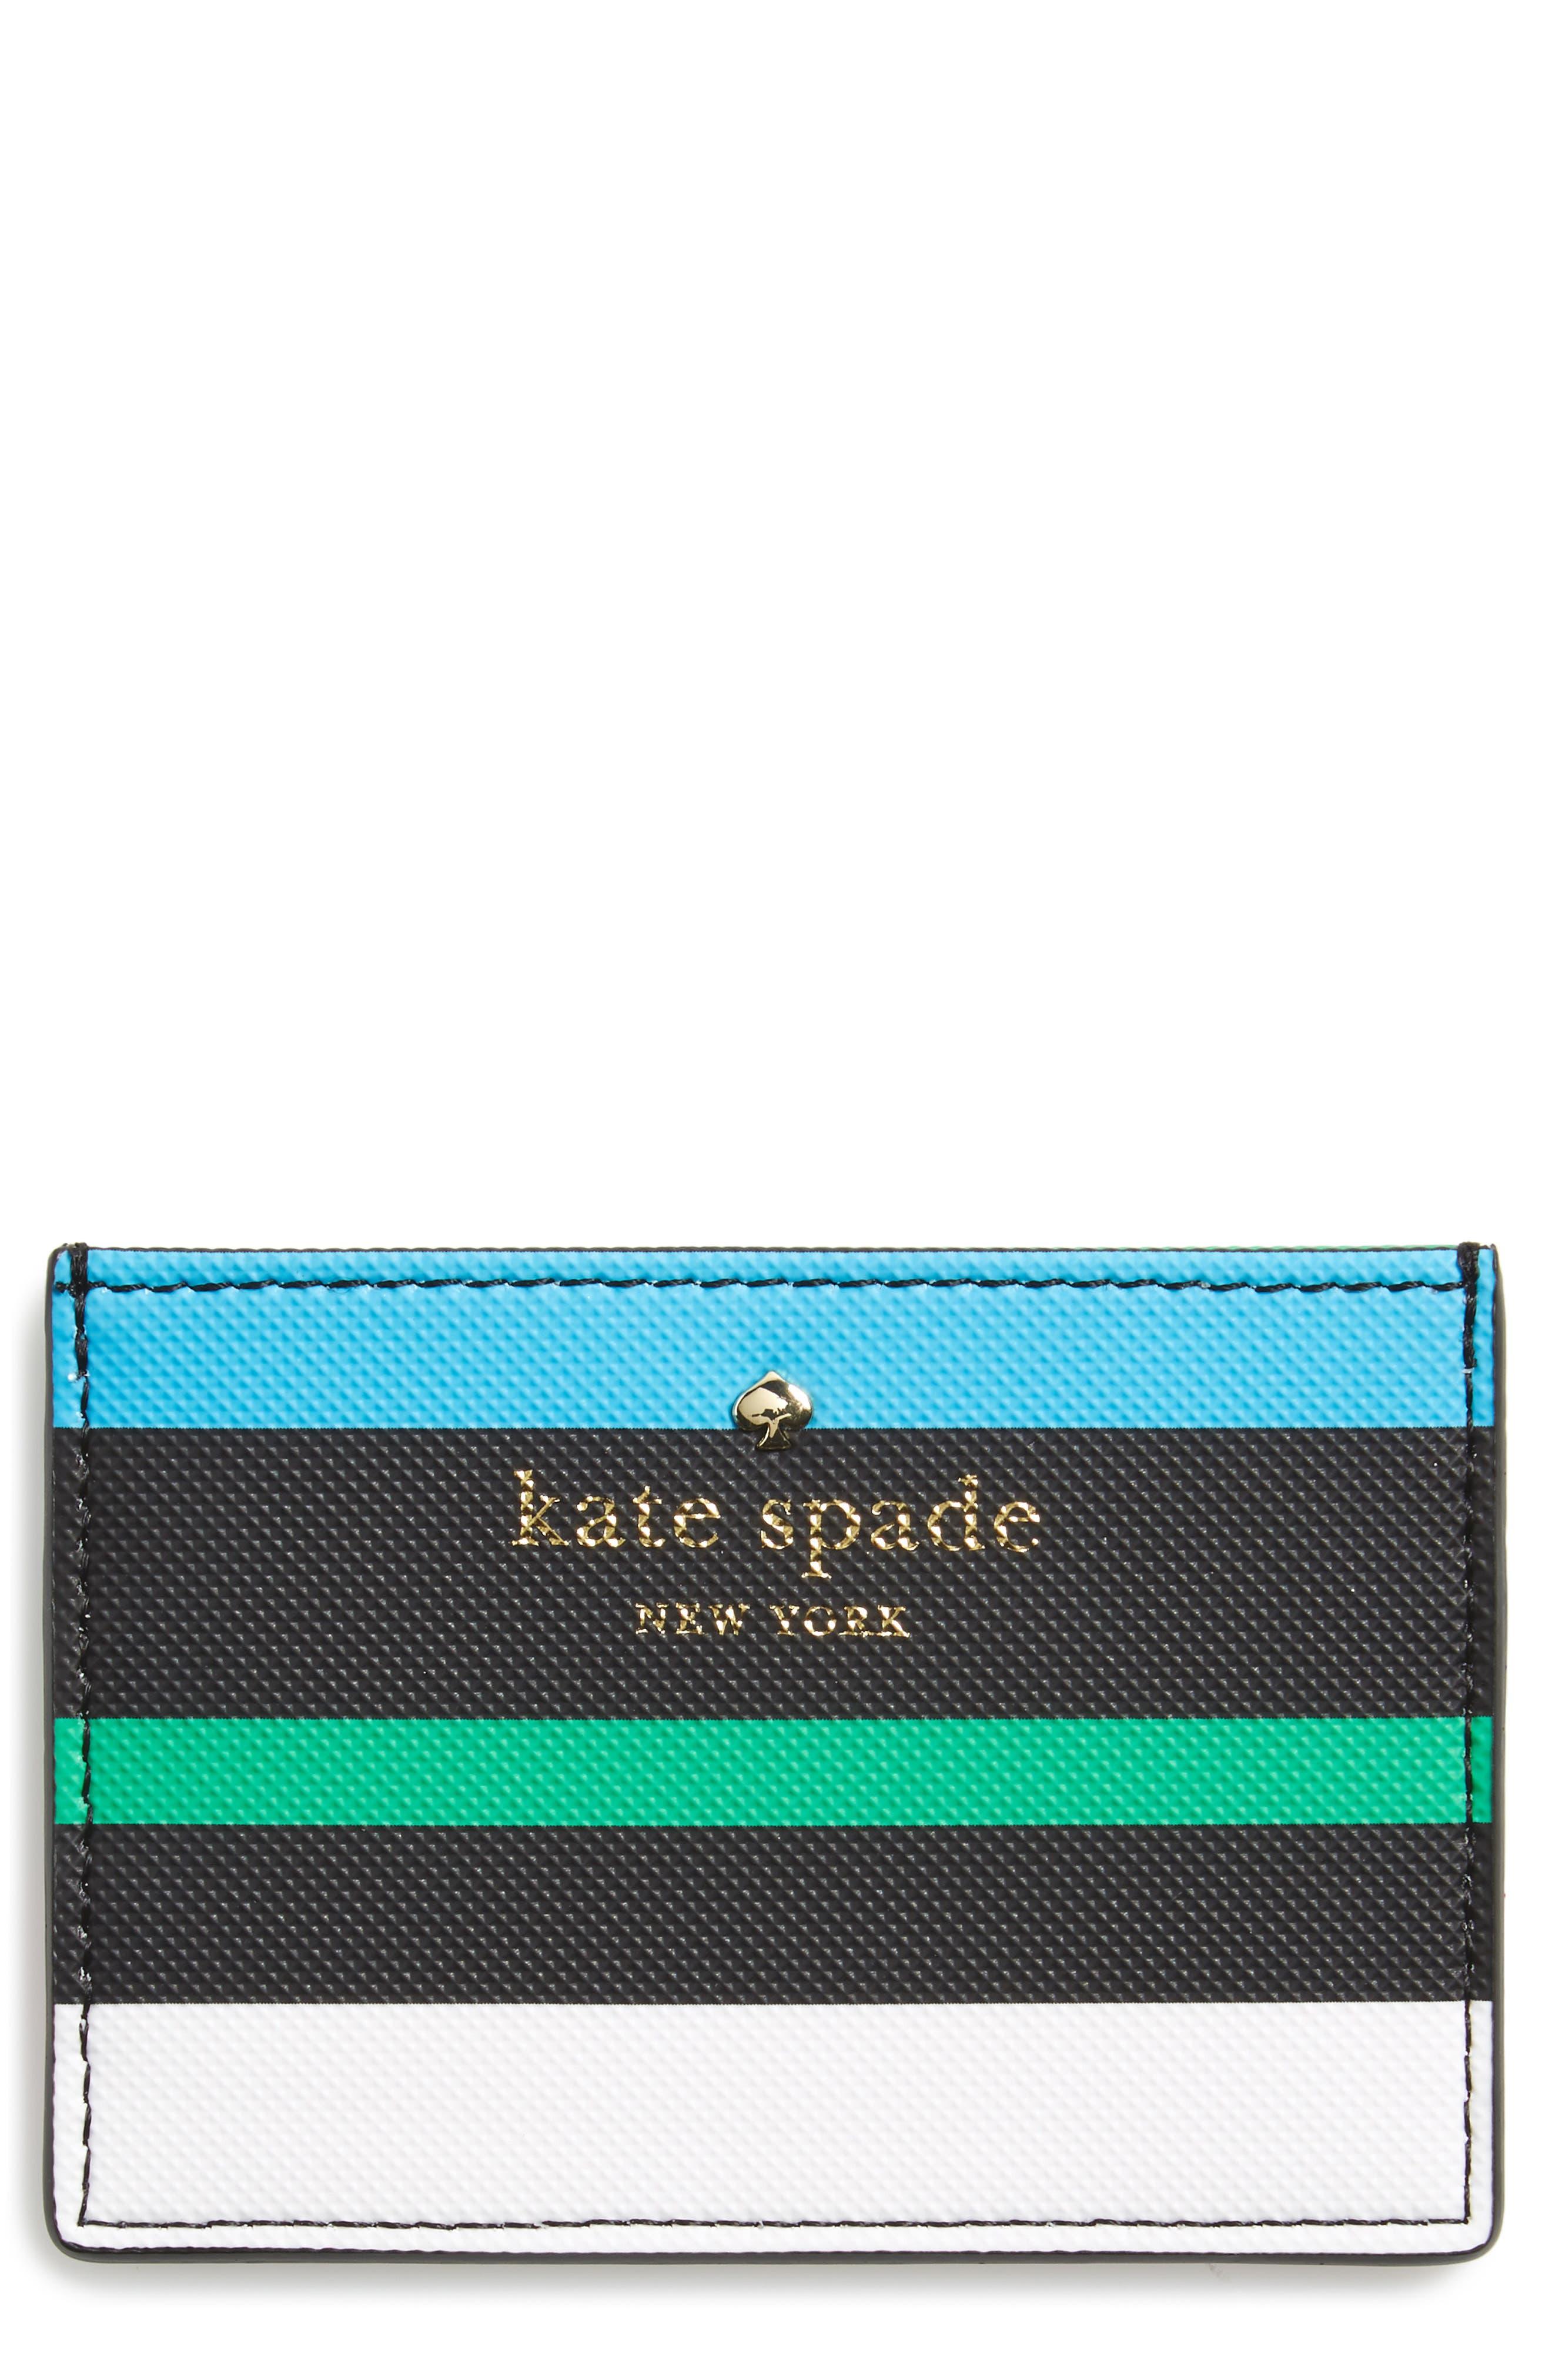 kate spade new york harding street fiesta card holder